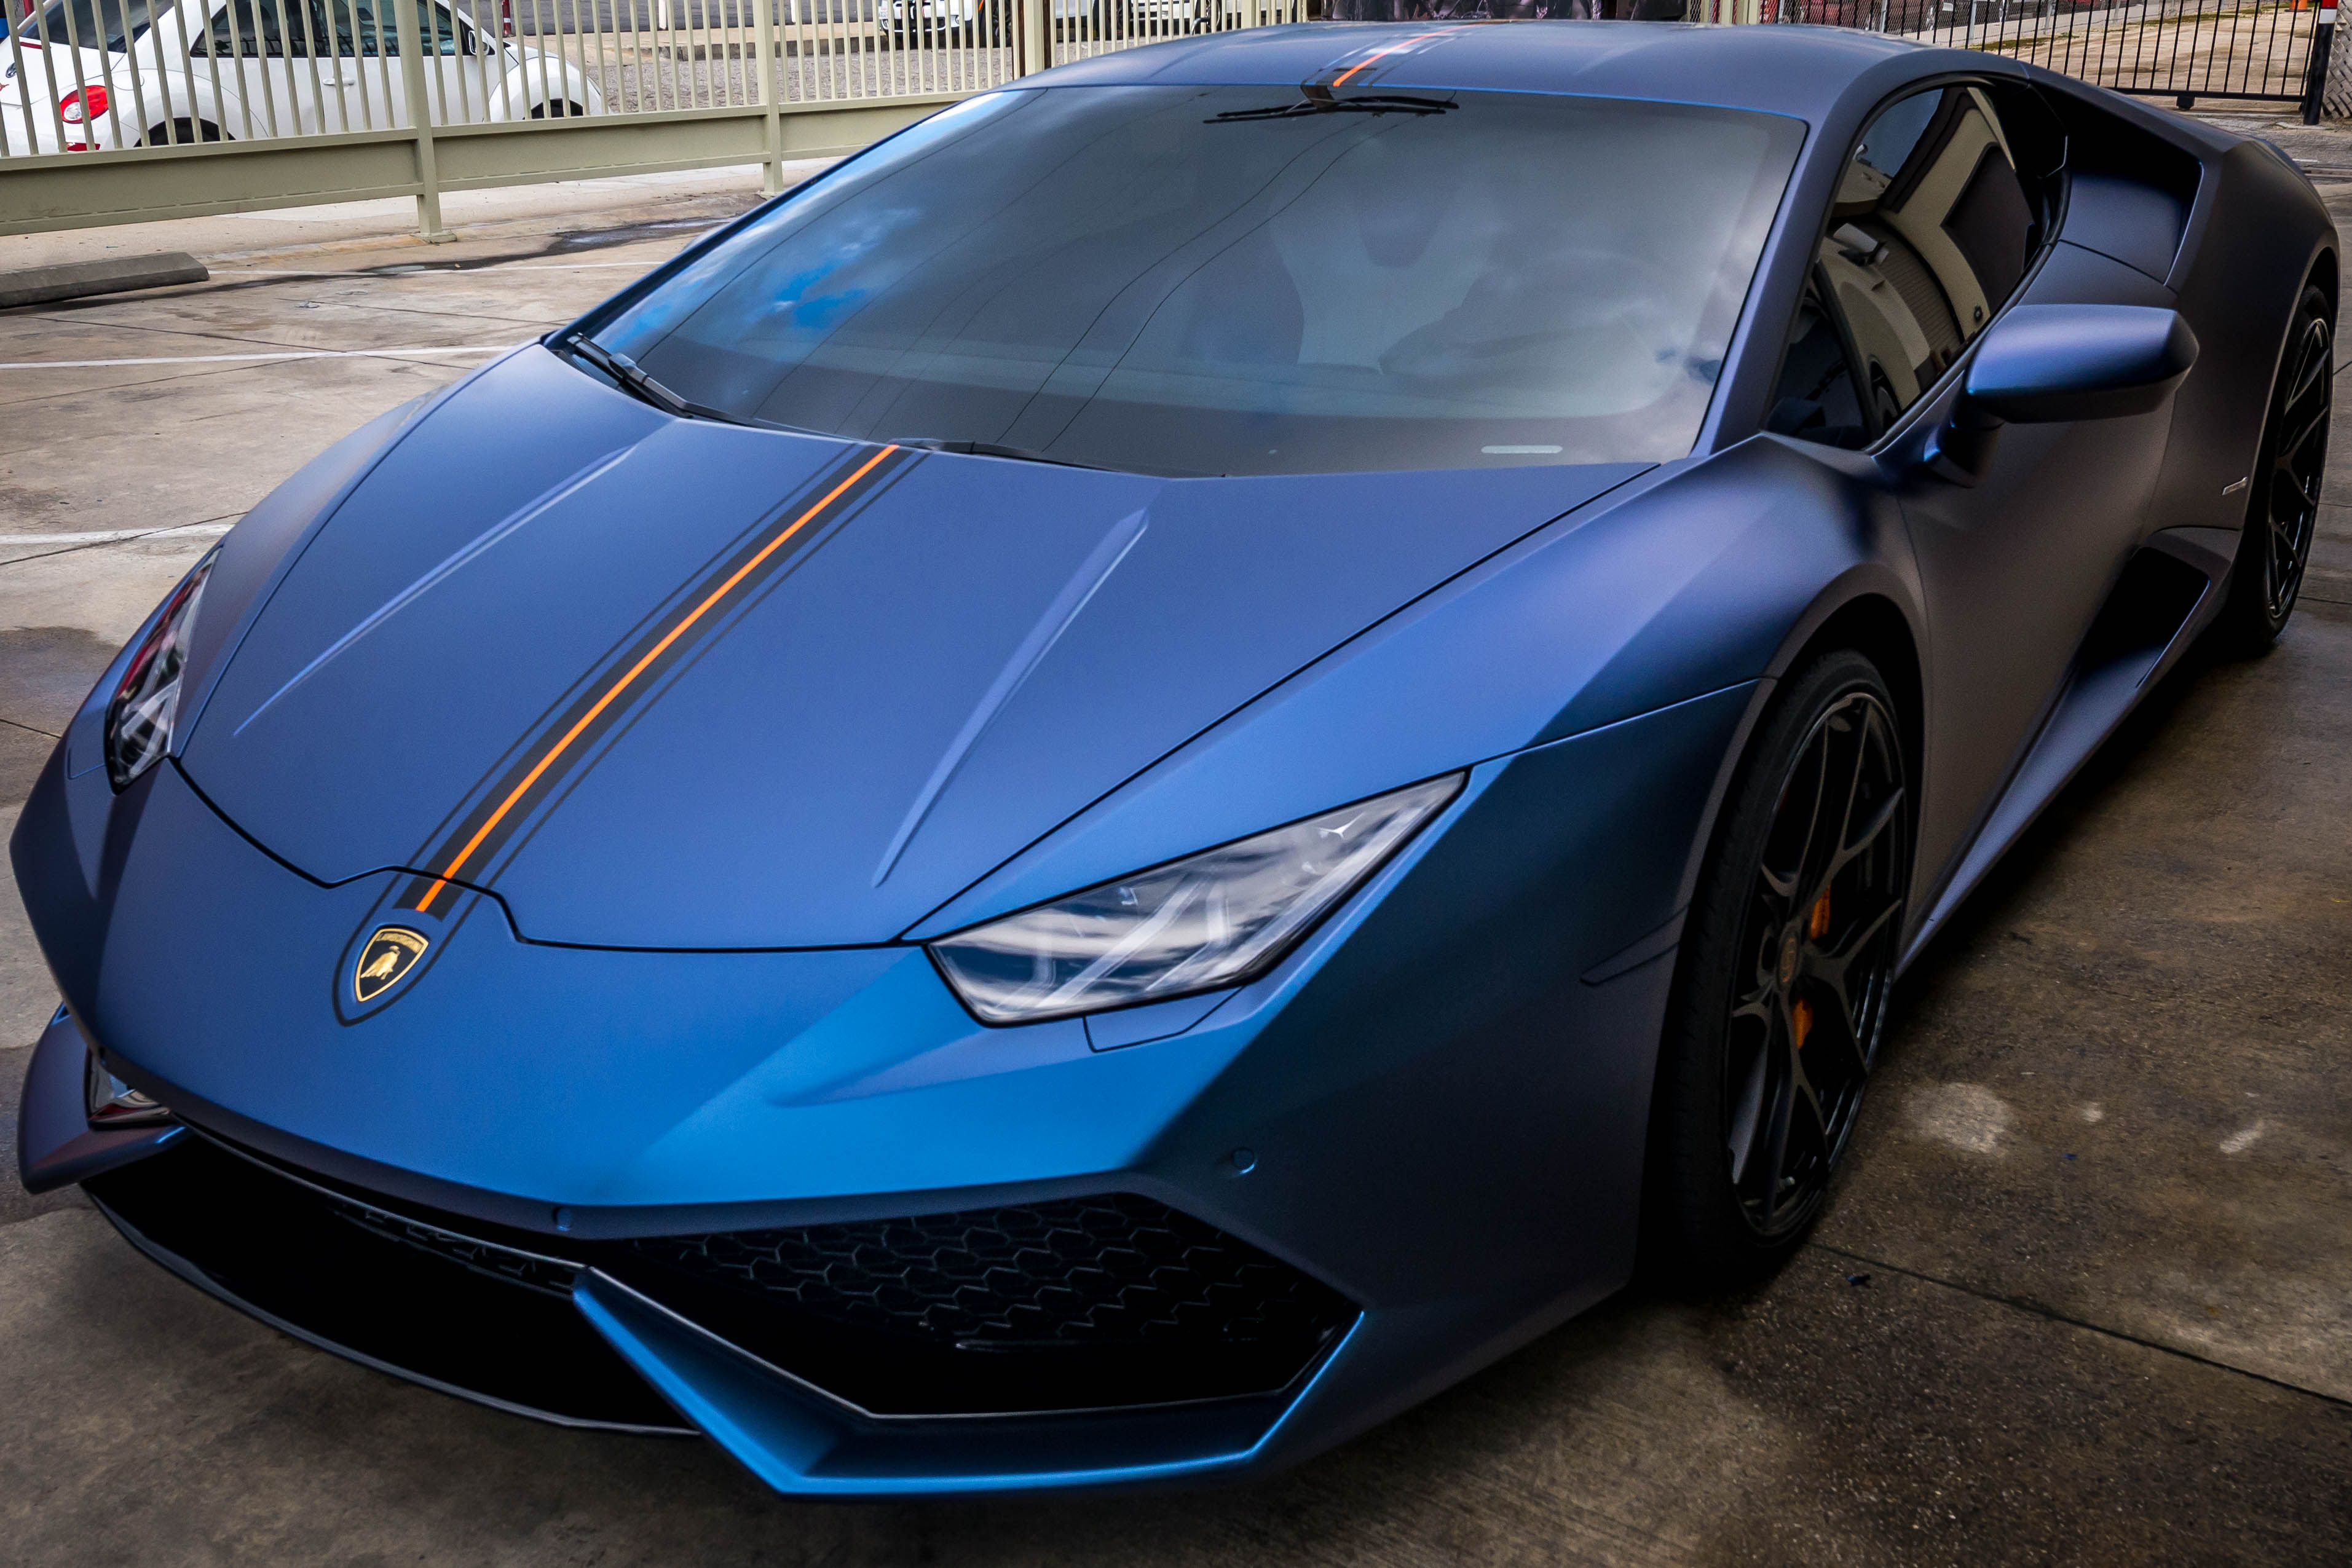 Lamborghini Huracan wrapped in Matte